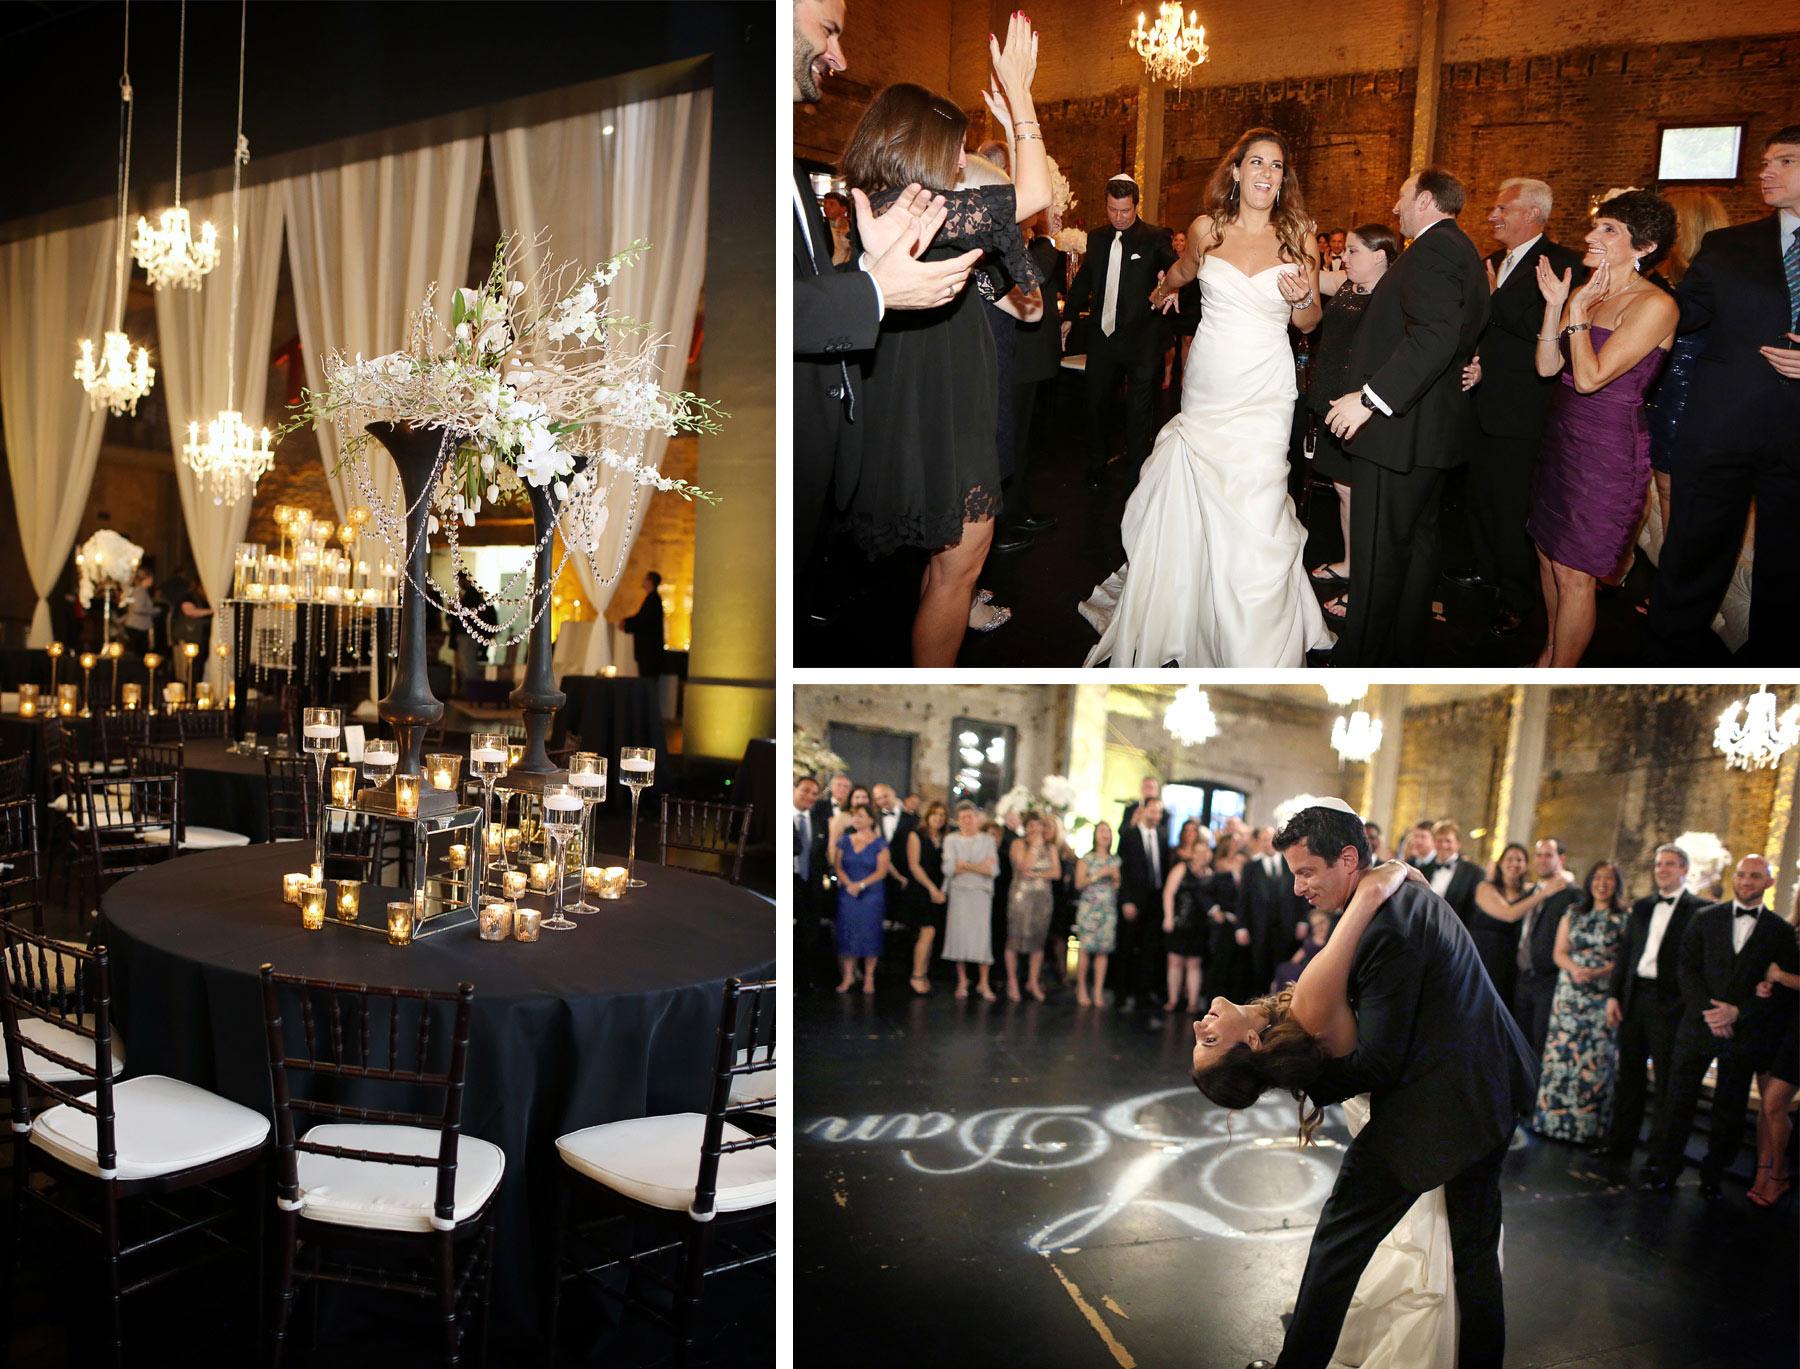 14-Minneapolis-Minnesota-Wedding-Photography-by-Vick-Photography-Aria-Reception-Decor-Layne-&-Dan.jpg